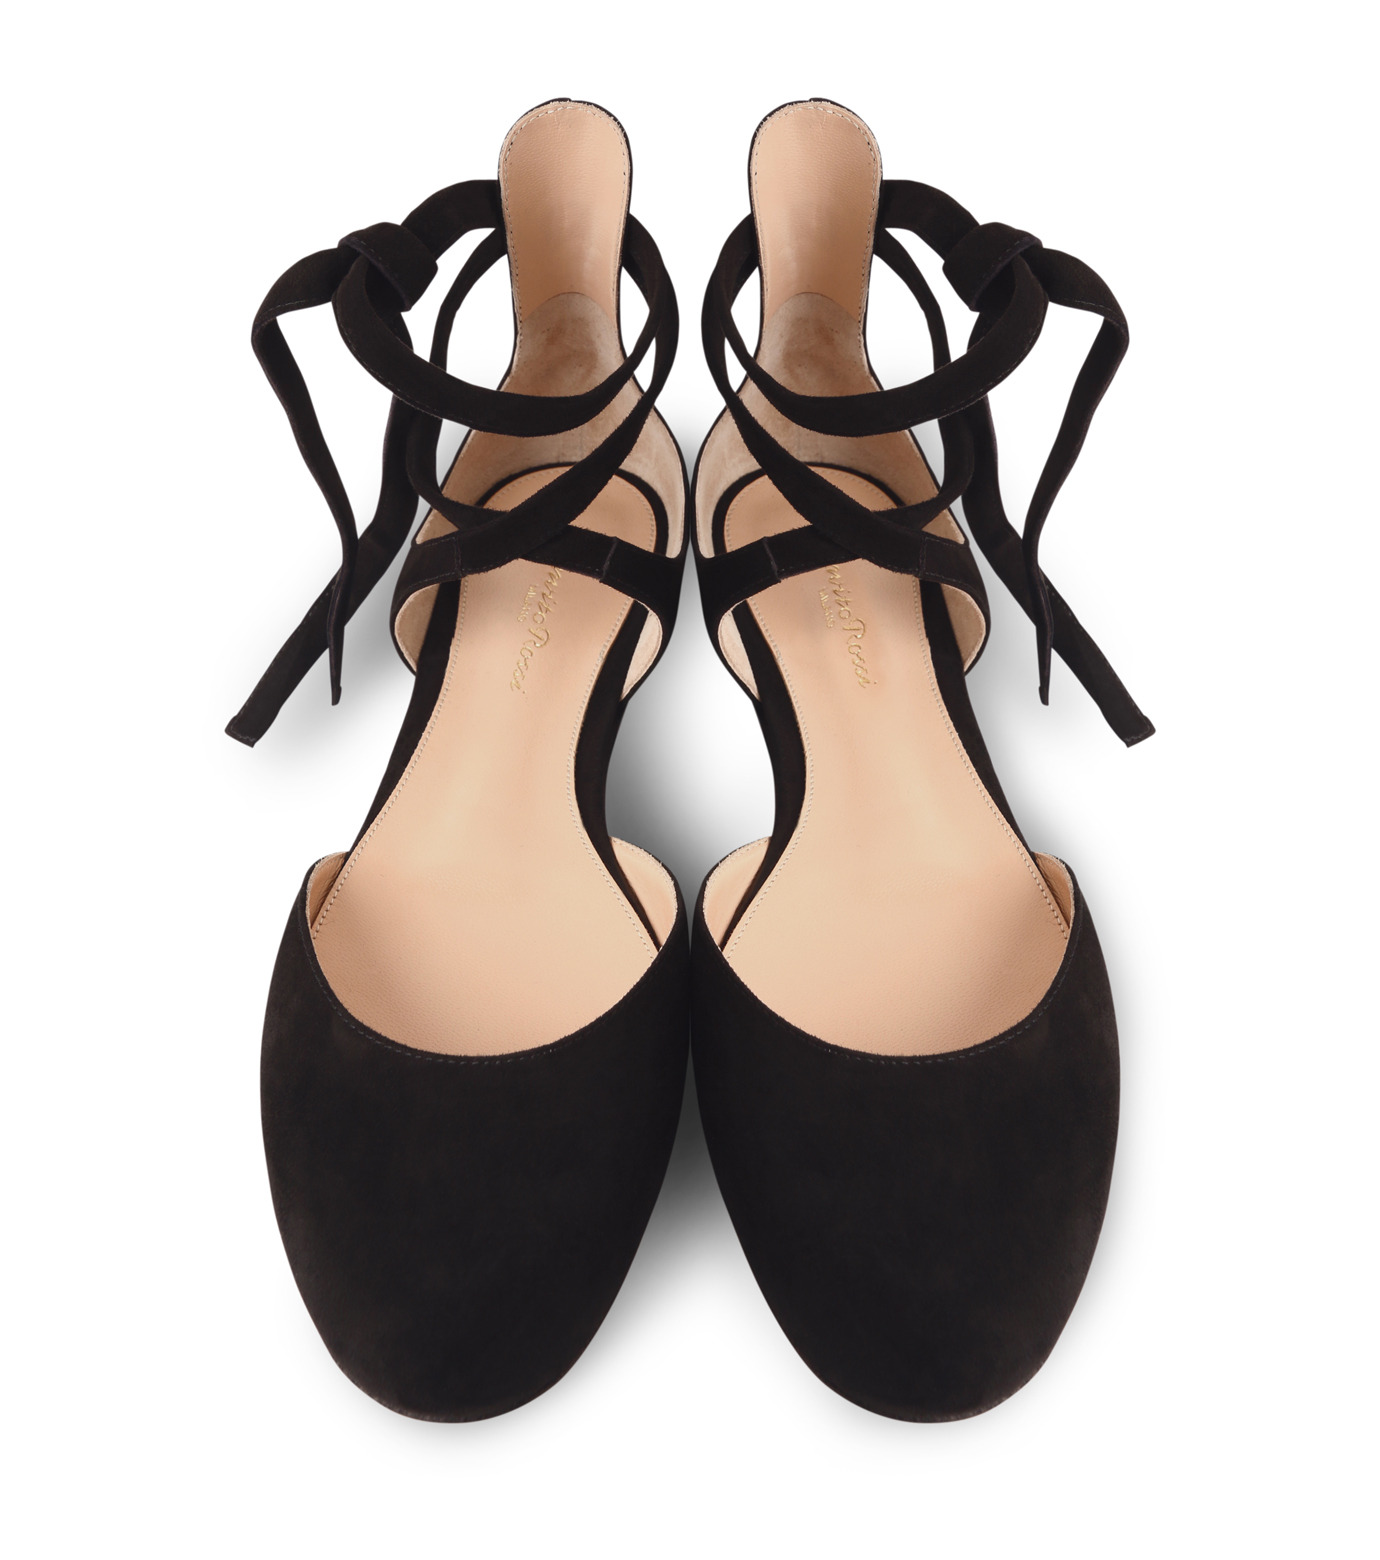 Gianvito Rossi(ジャンヴィト ロッシ)のNew Round Toe Flat w/Ankle Strap-BLACK(フラットシューズ/Flat shoes)-40615-13 拡大詳細画像4